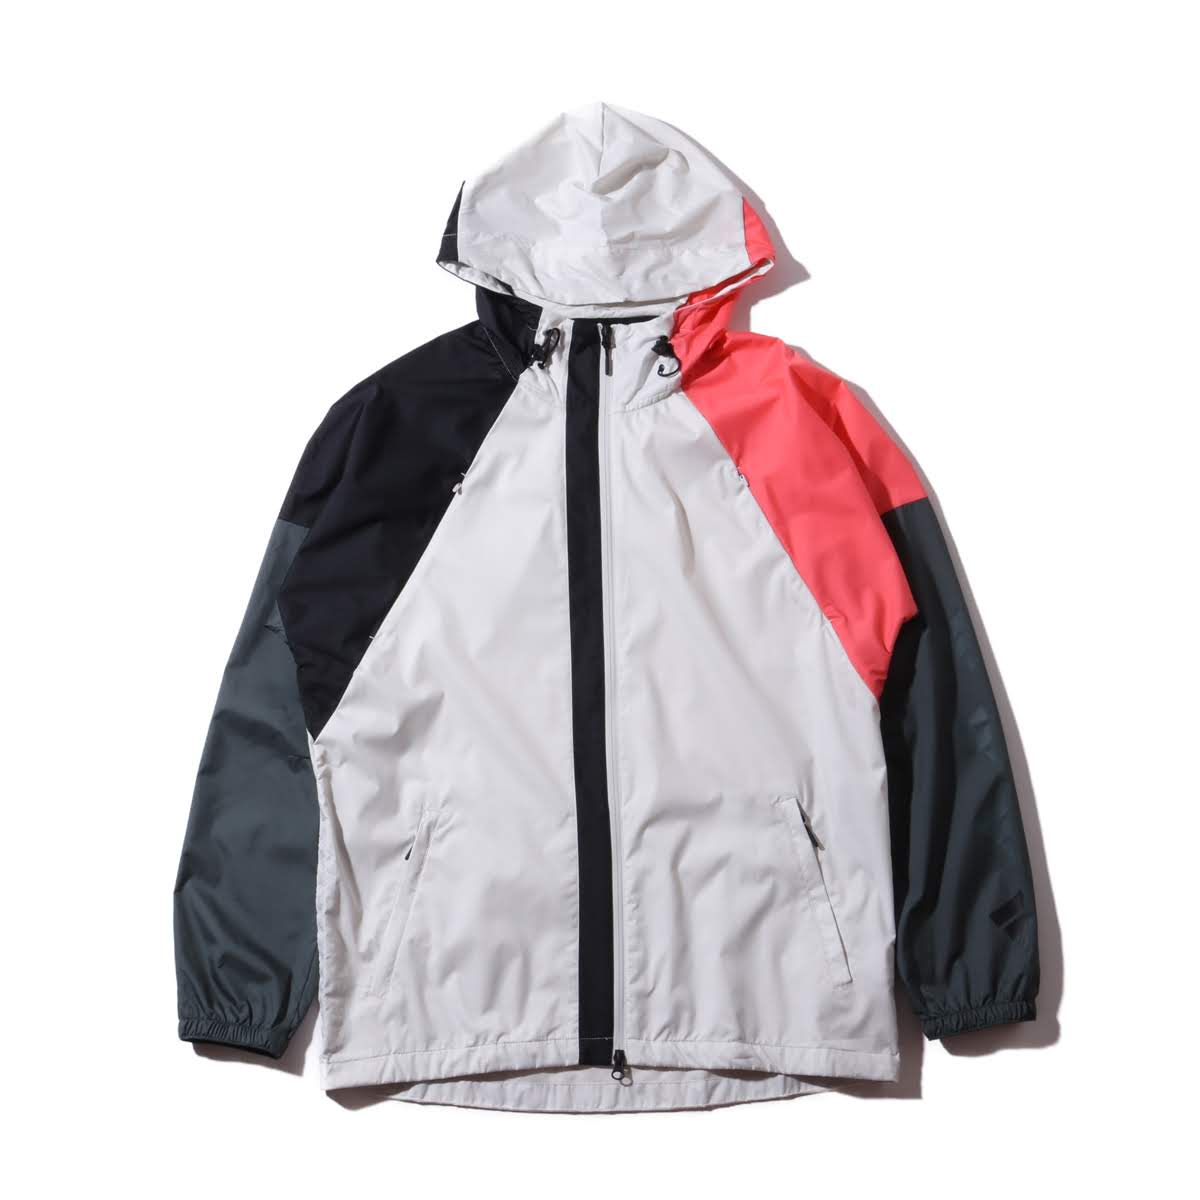 adidas M THE PACK WND JACKET (アディダス M ザ パック ウィンド ジャケット)RAW WHITE/LEGEND IVY/BLACK/PRISM PINK【メンズ ジャケット】19SS-I